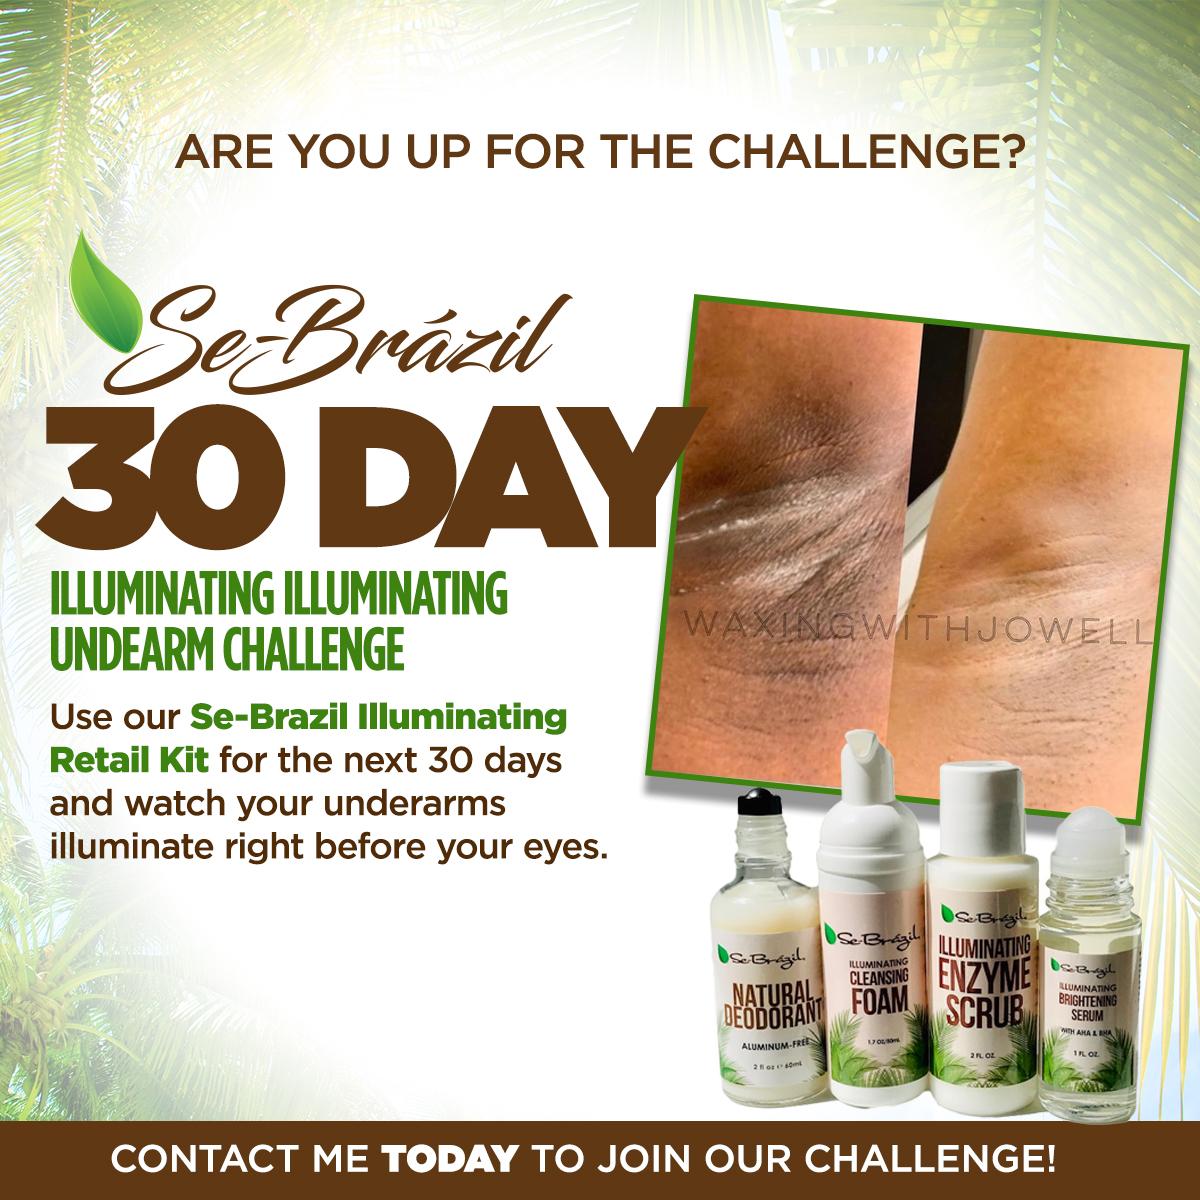 se-braazil-30-day-underarm-challenge2.jpg